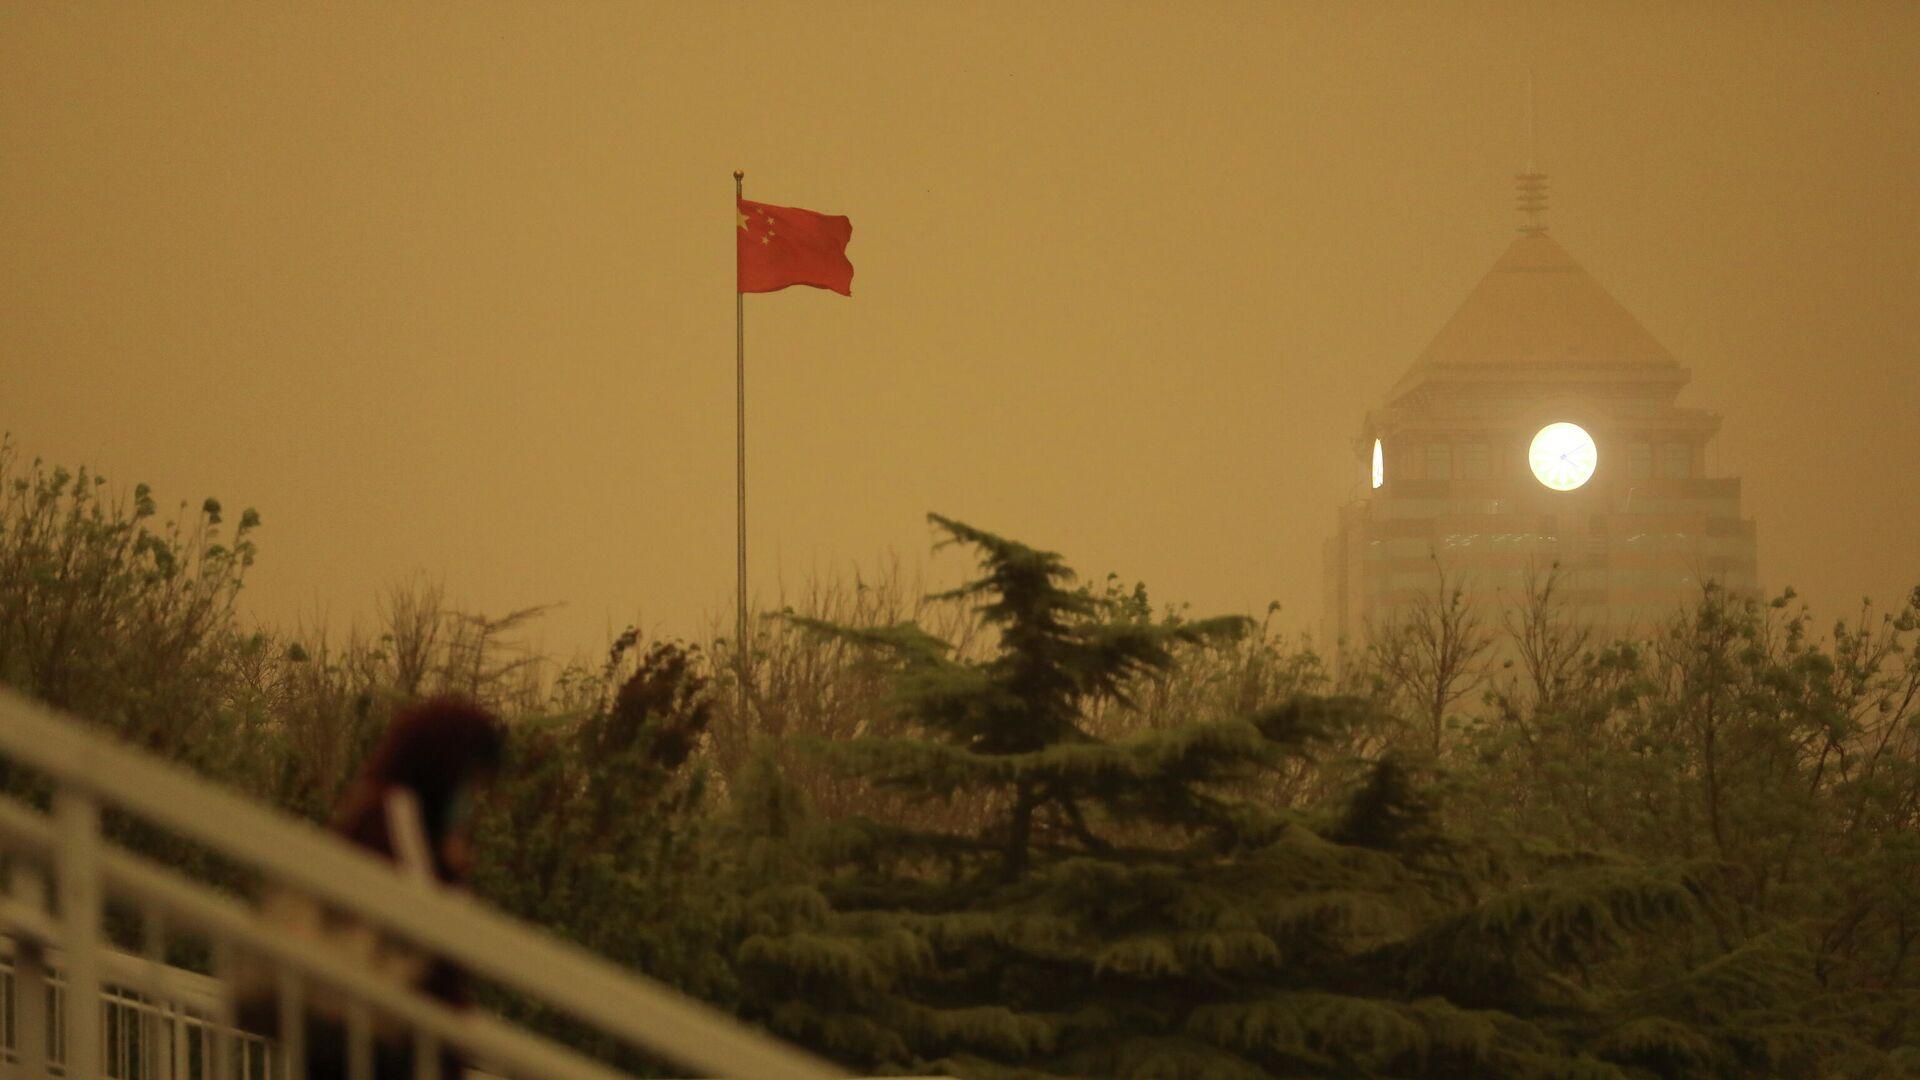 Tormenta de arena en Pekín - Sputnik Mundo, 1920, 15.04.2021